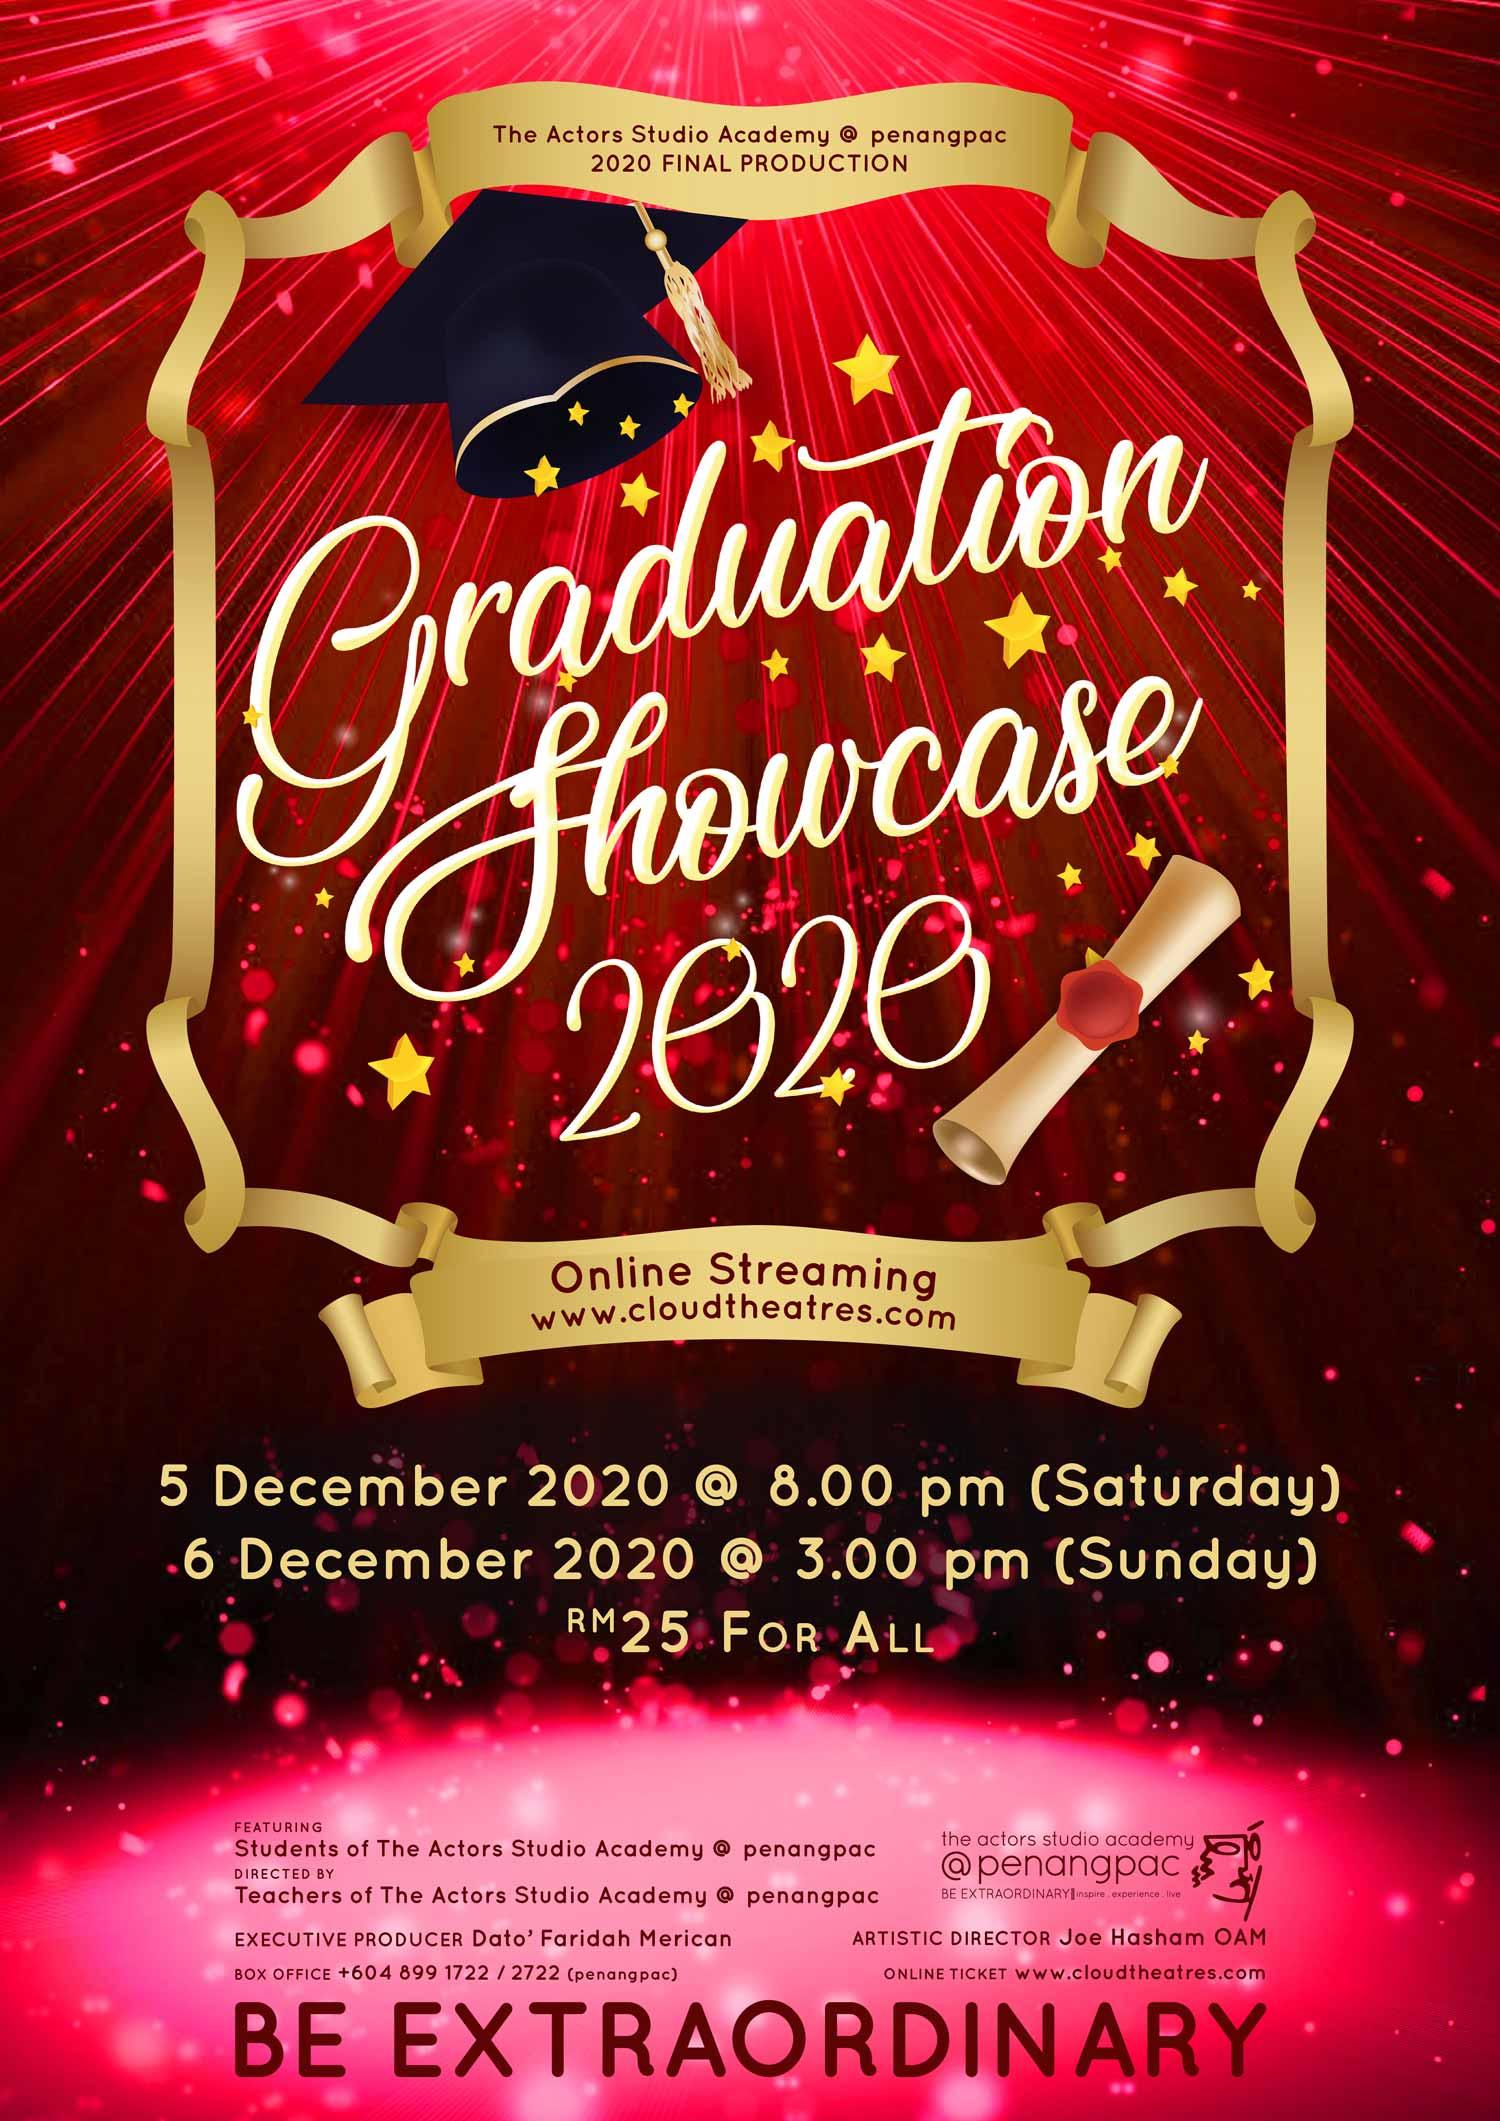 Graduation Showcase 2020